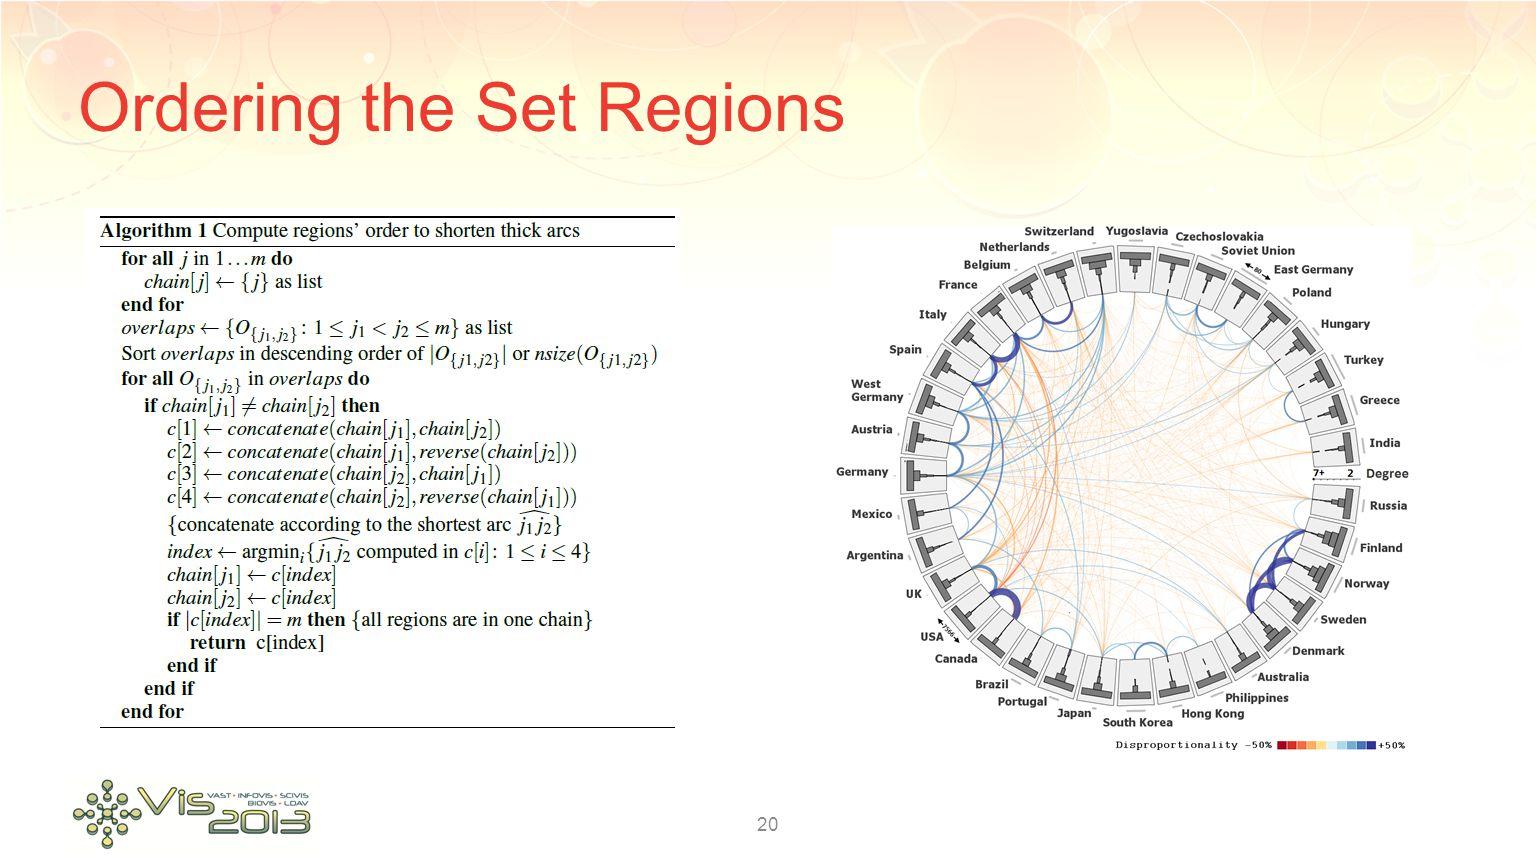 Ordering the Set Regions 20